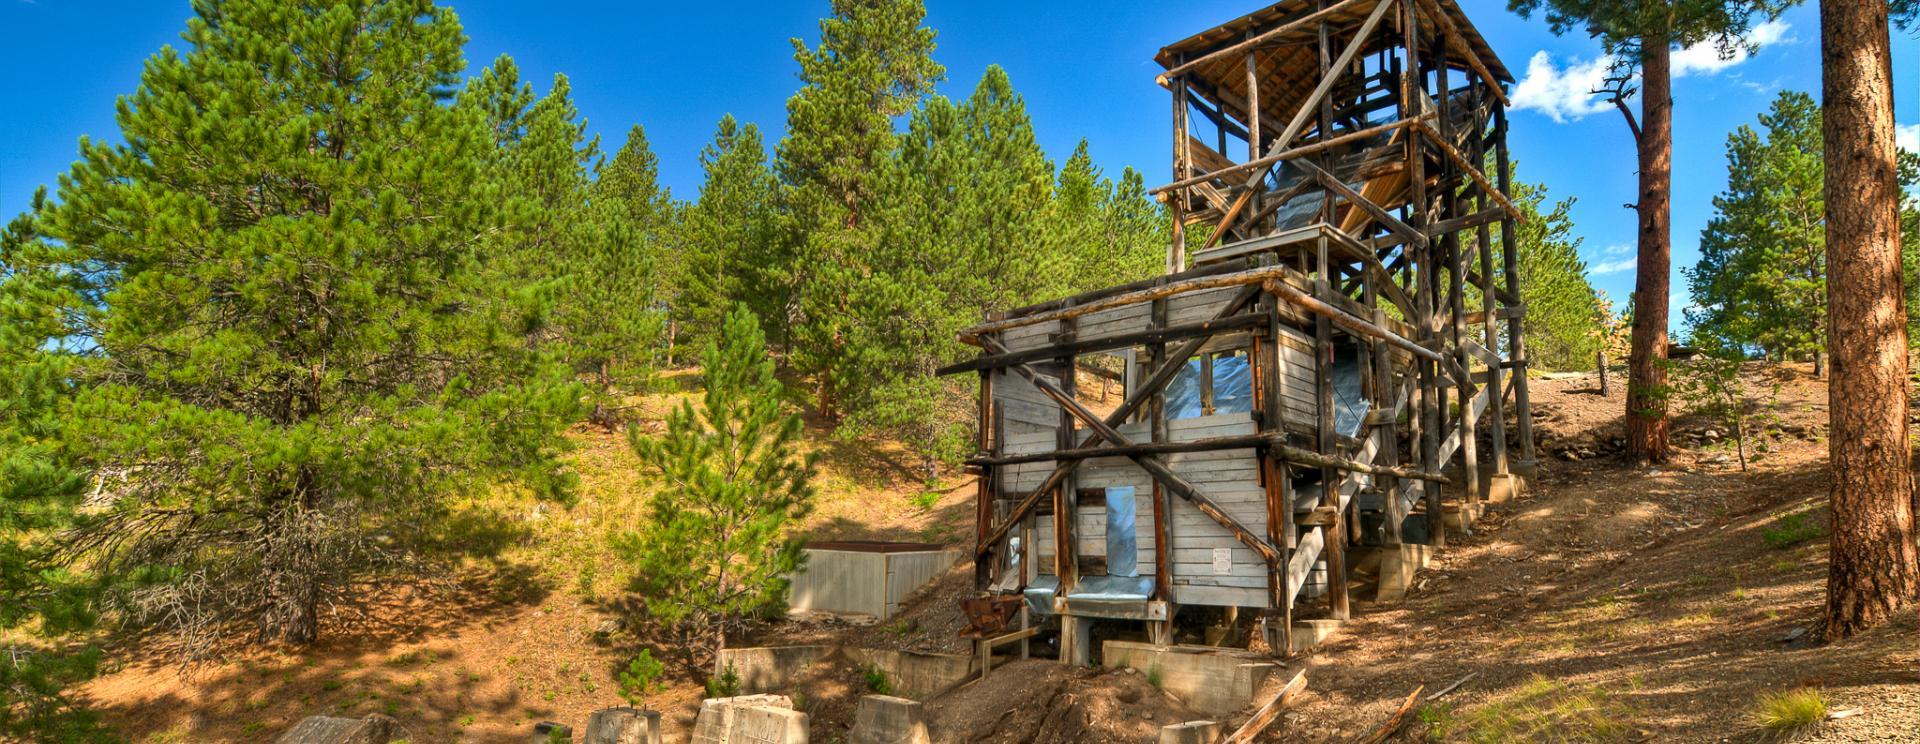 Gold Mountain Mine